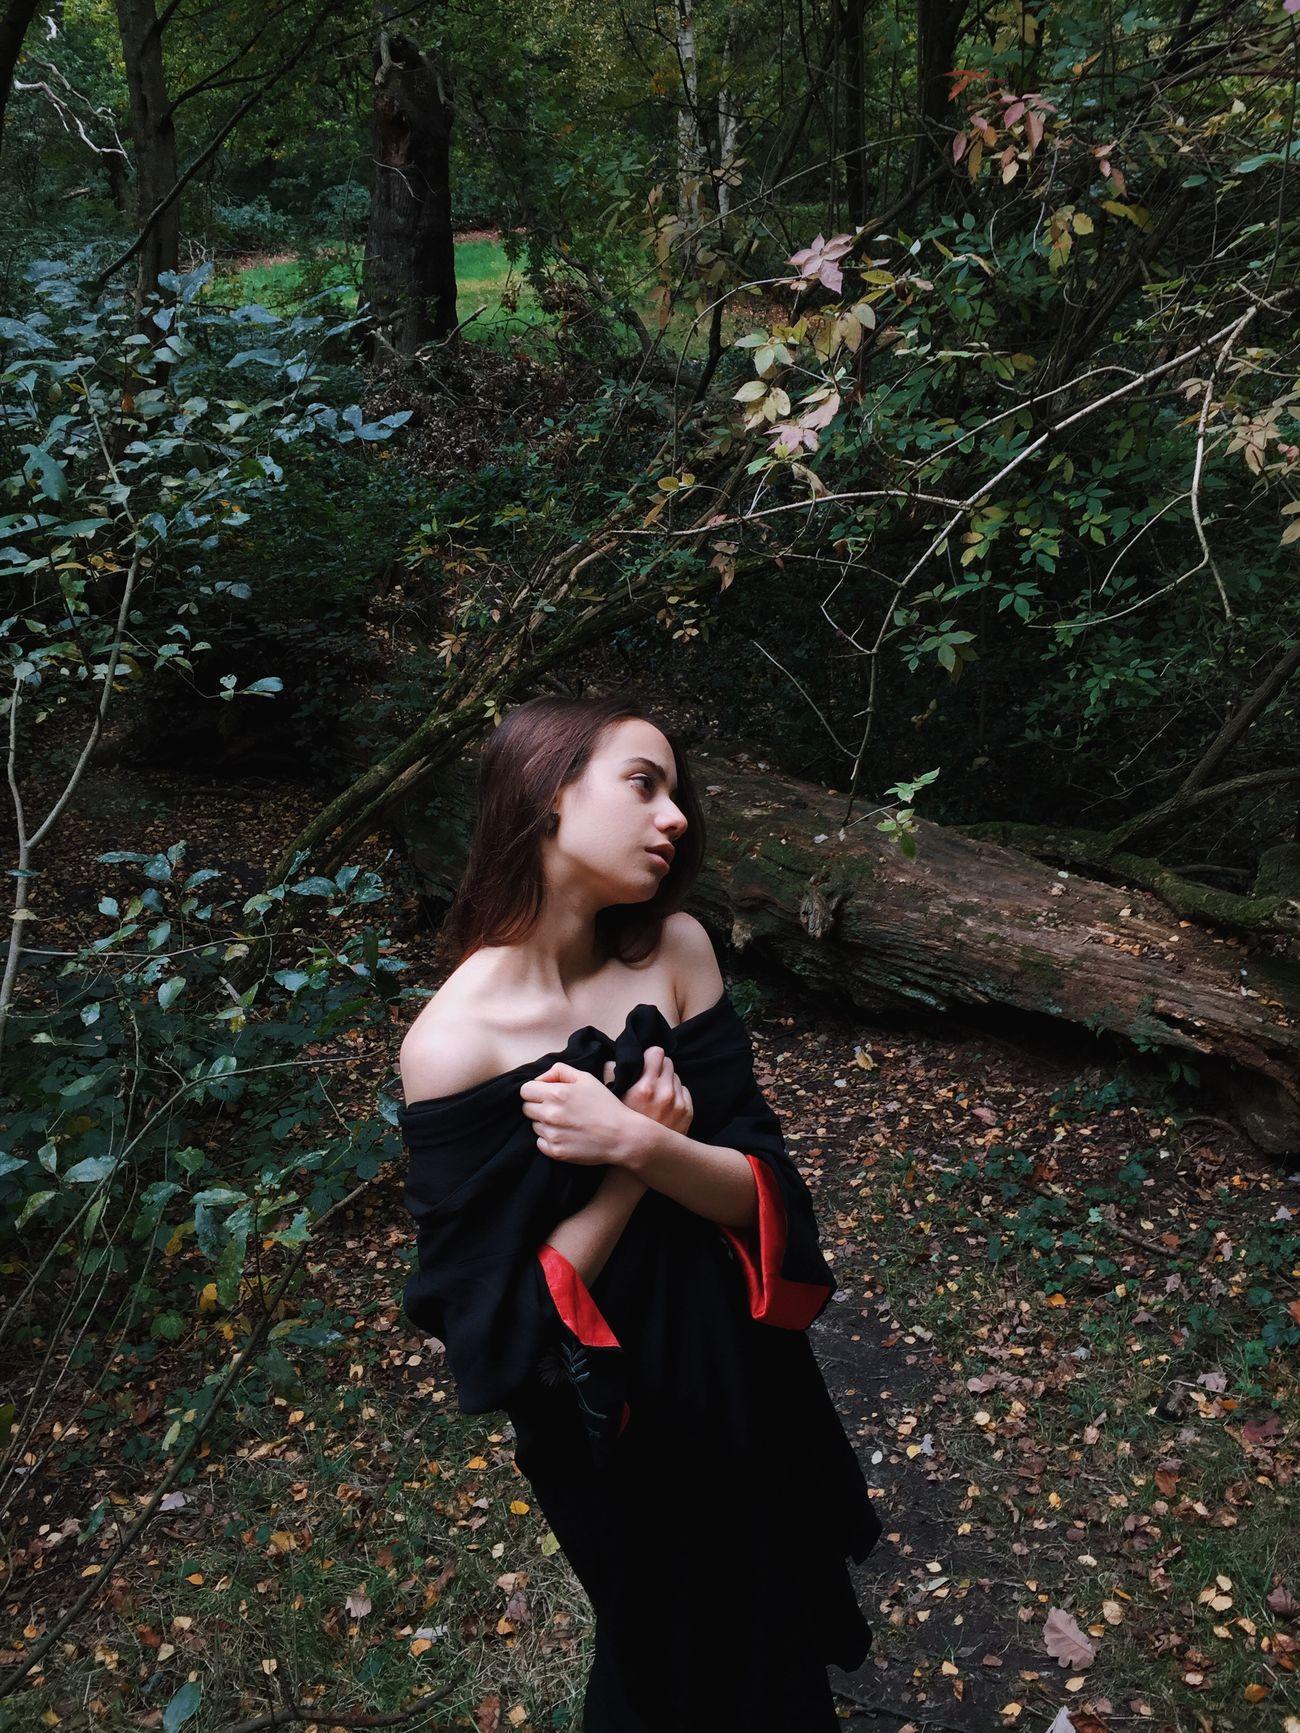 Lizzy in London in the Woods Model Portrait Of A Woman